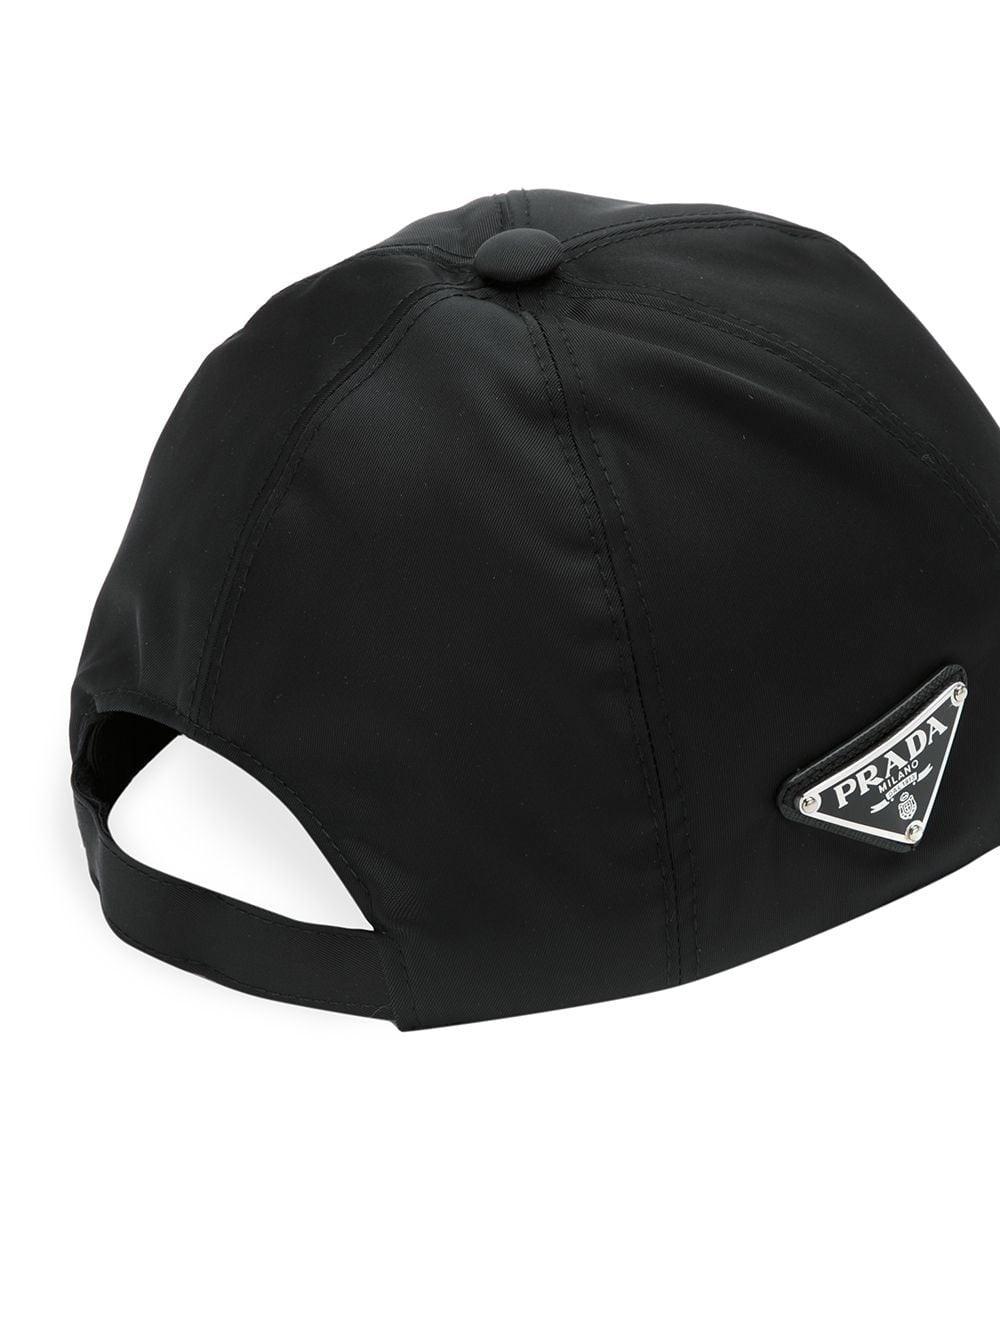 prada BASEBALL CAP available on montiboutique.com - 24986 51d148624bf